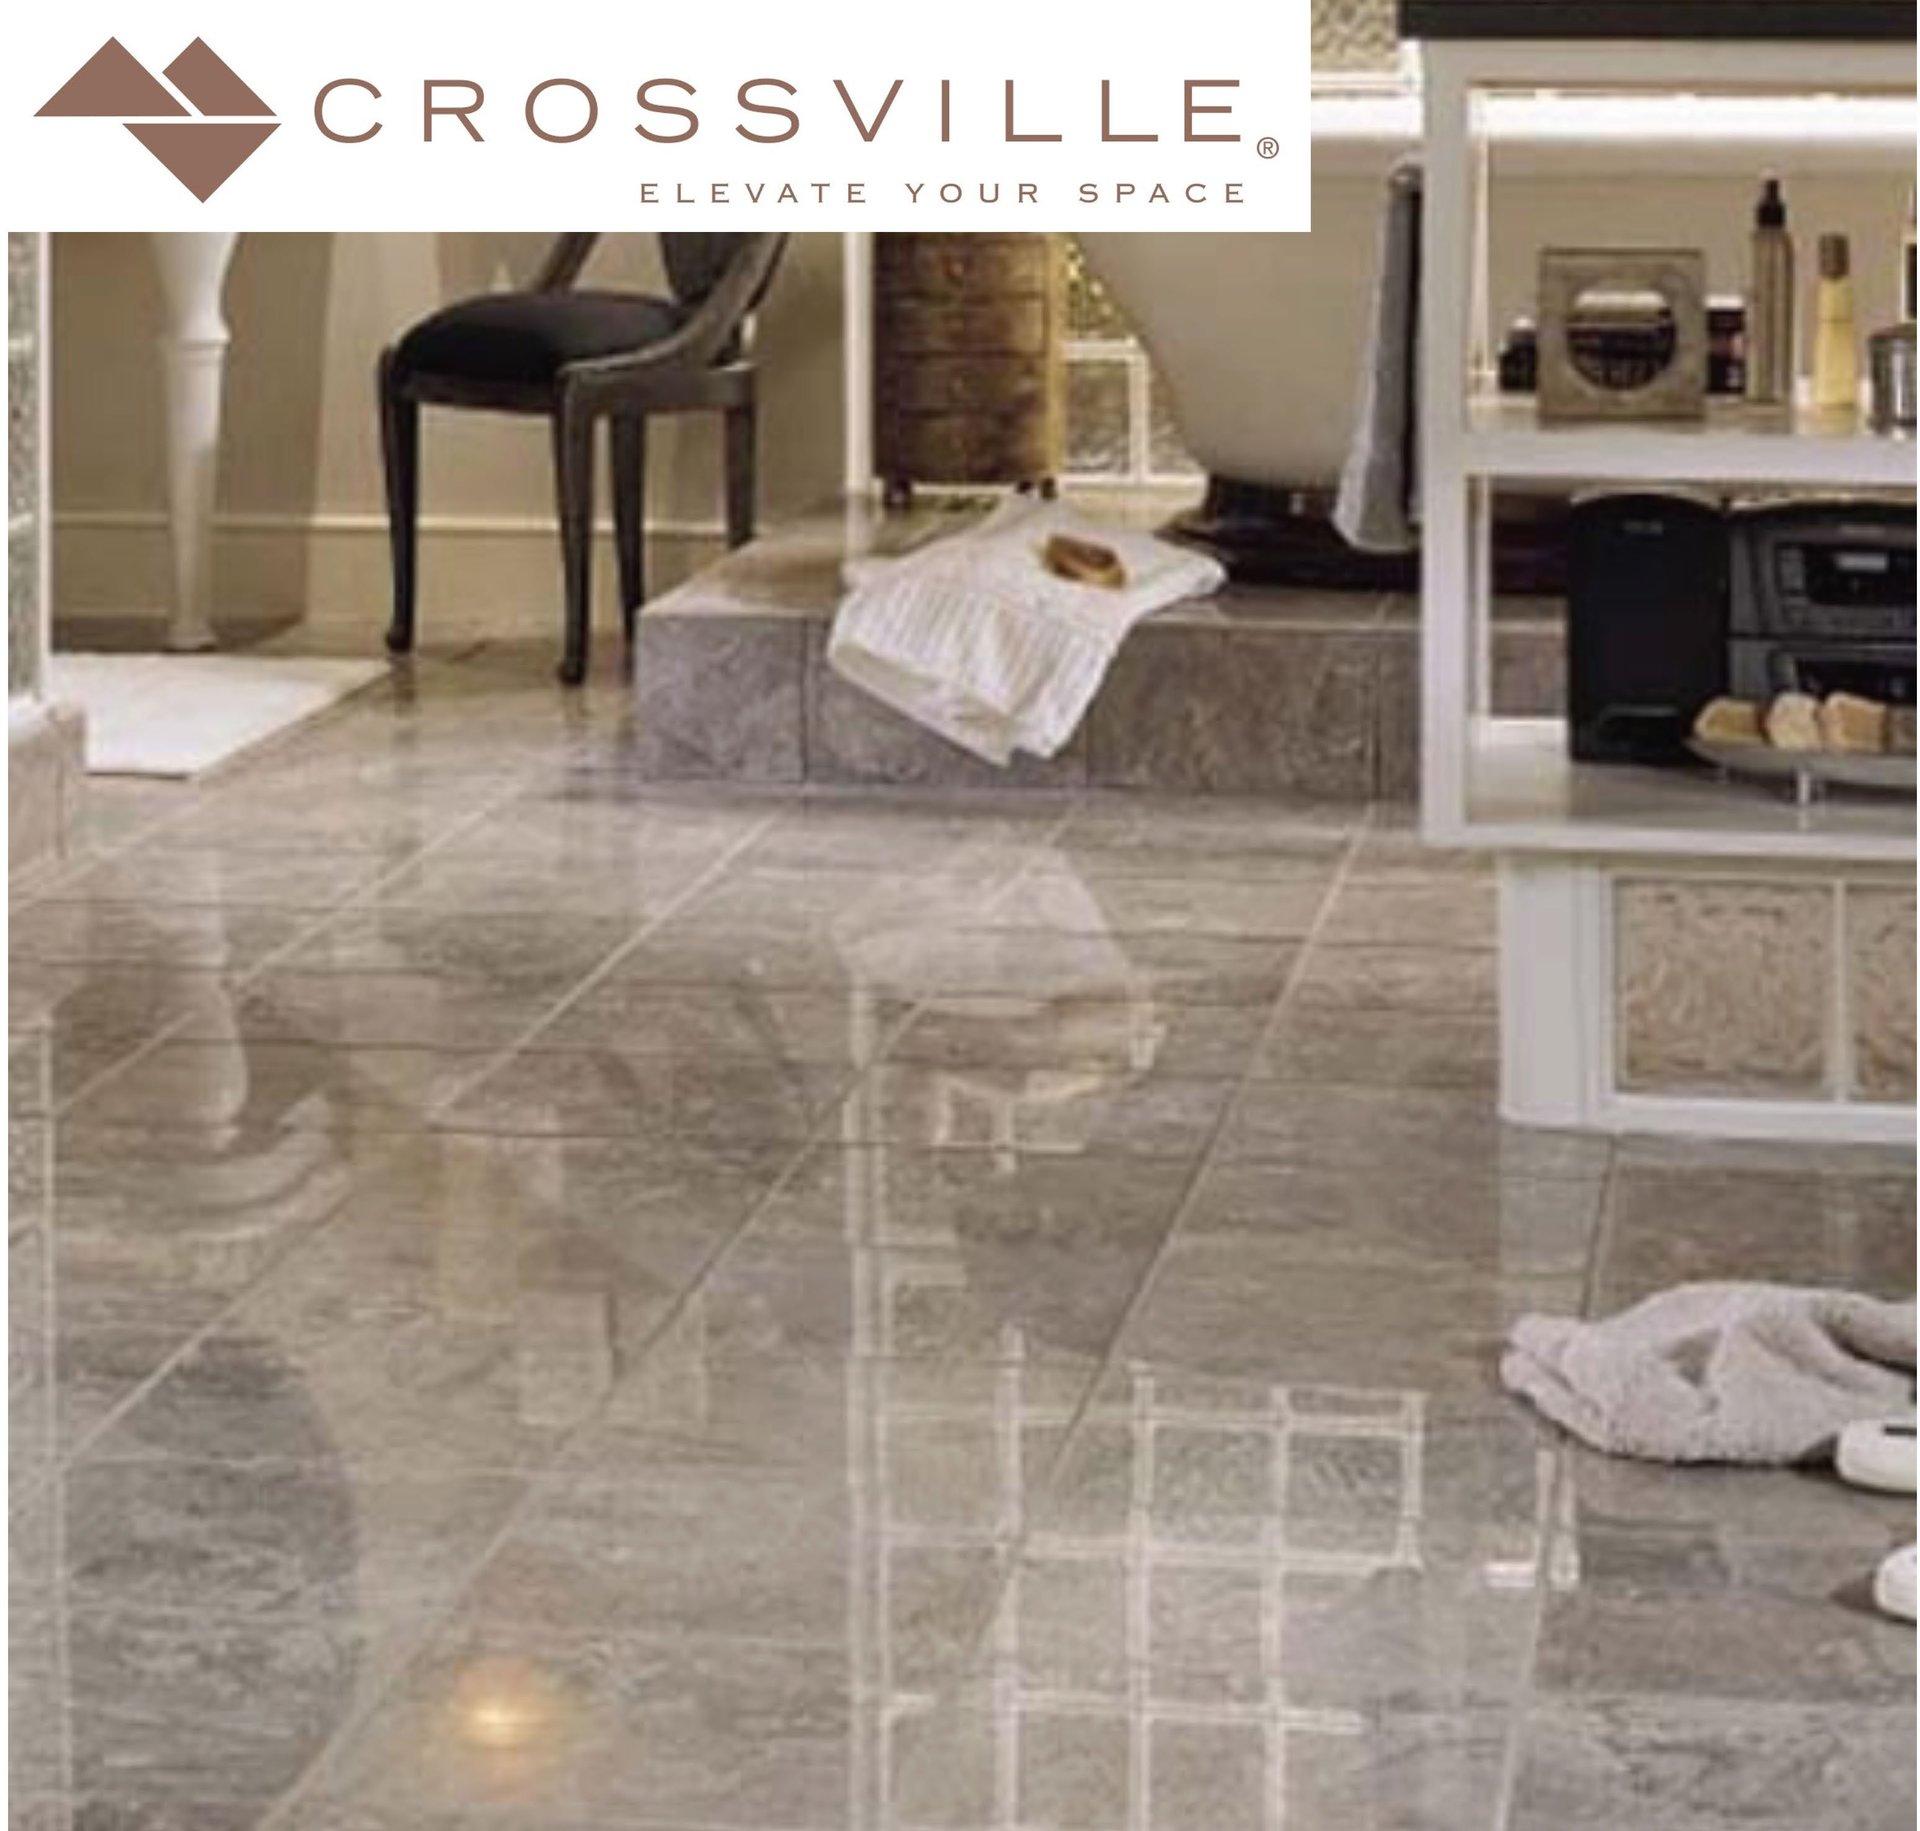 Crossville tile & stone